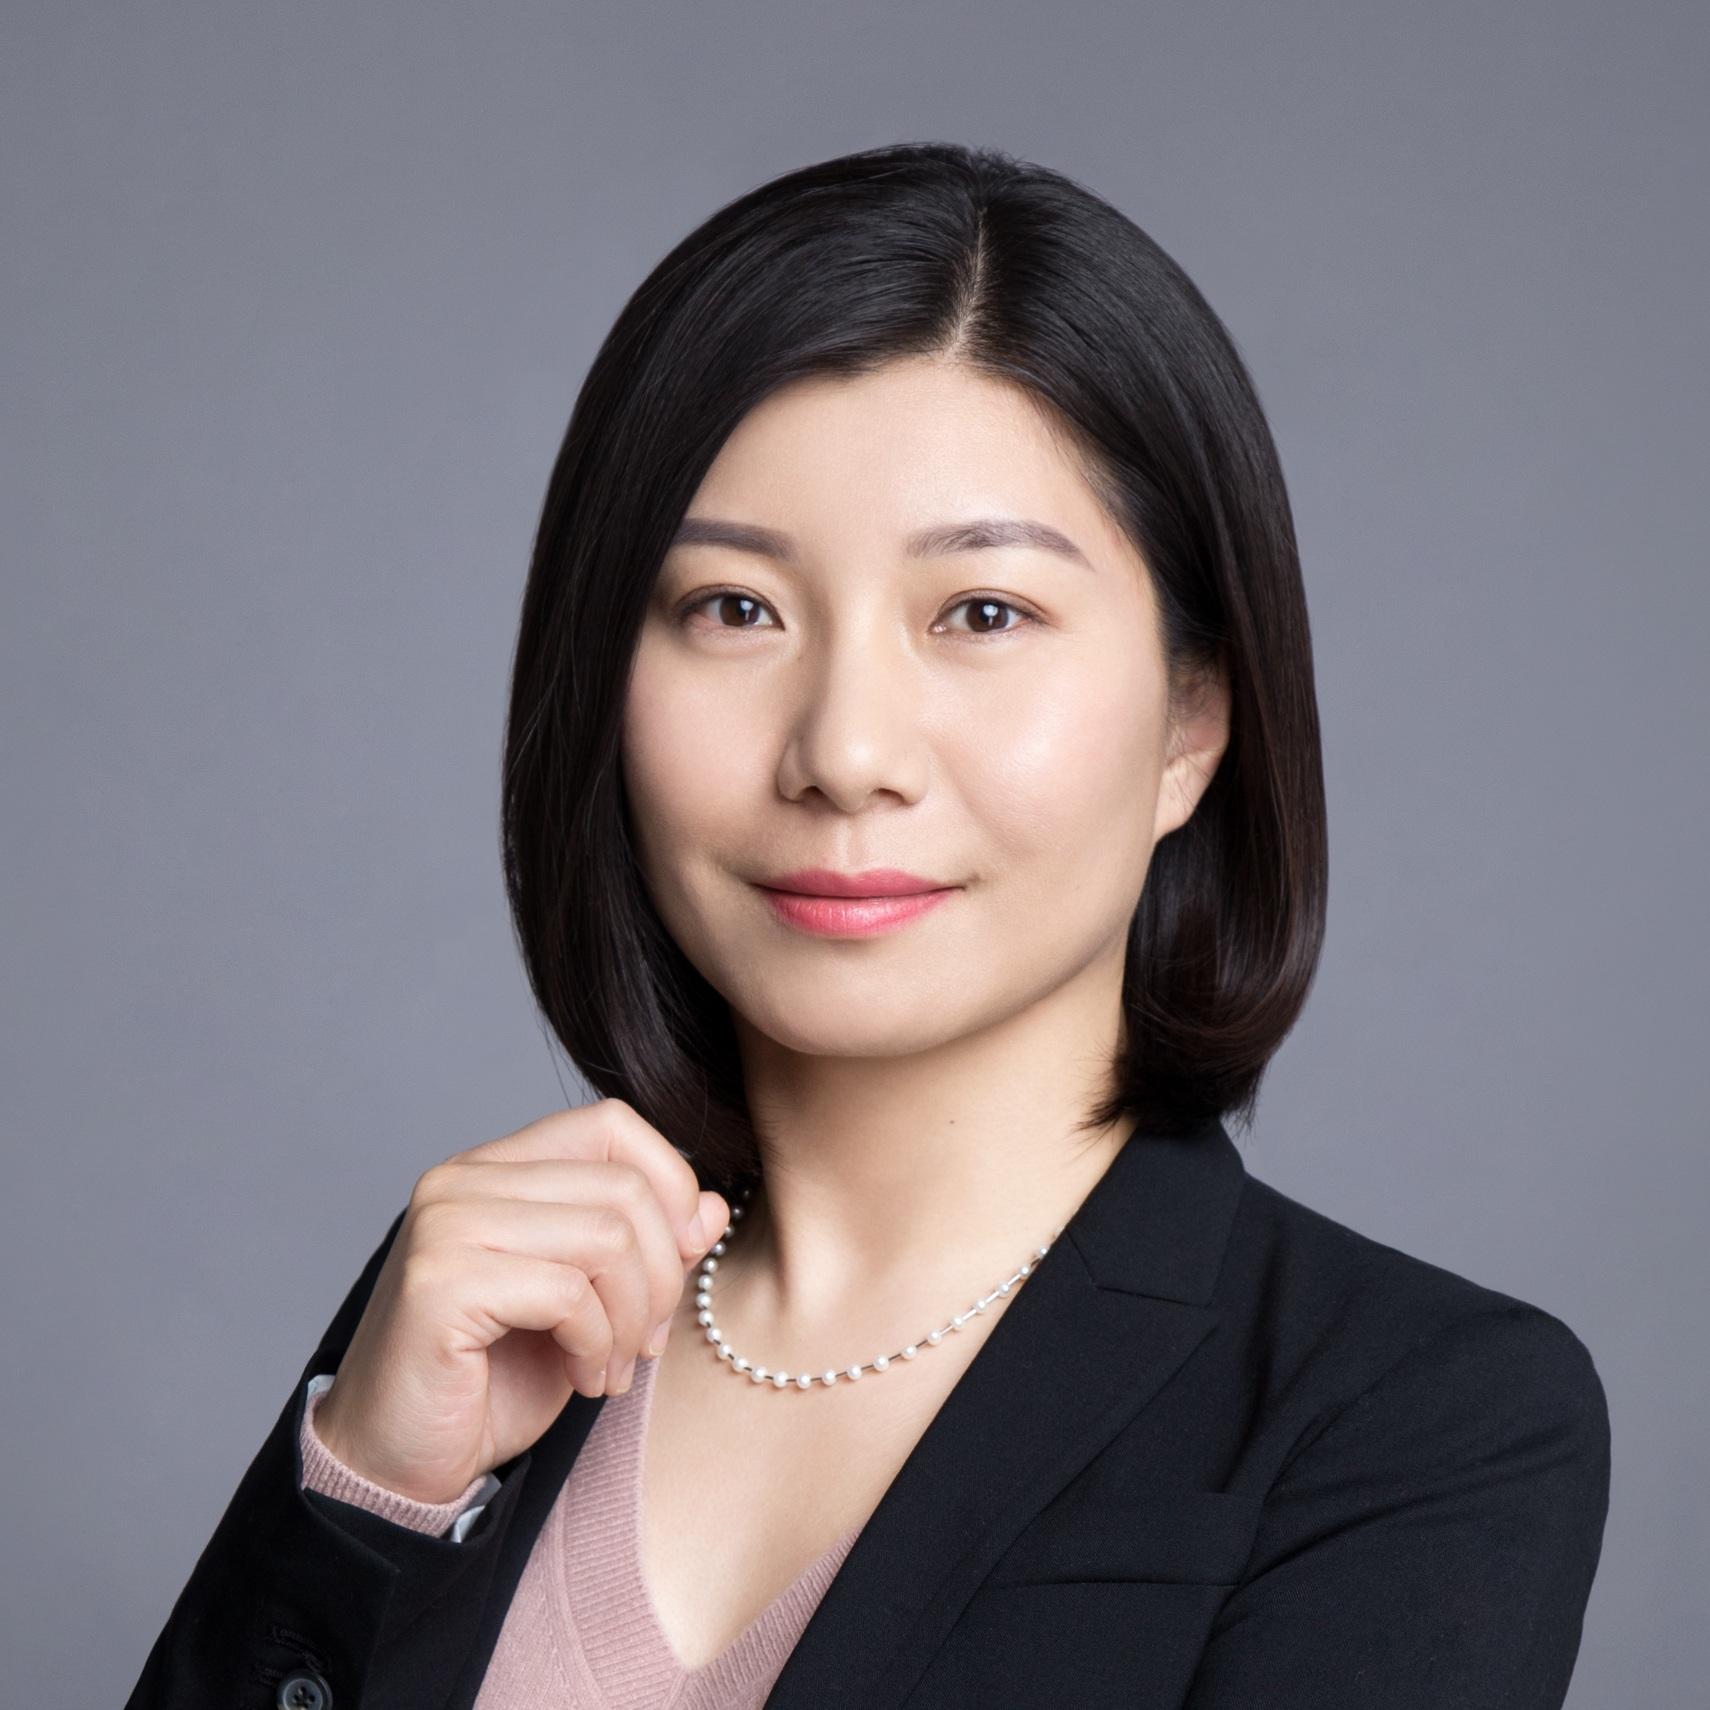 陈燕娟 - Vickie,New Code 创始人兼CEO